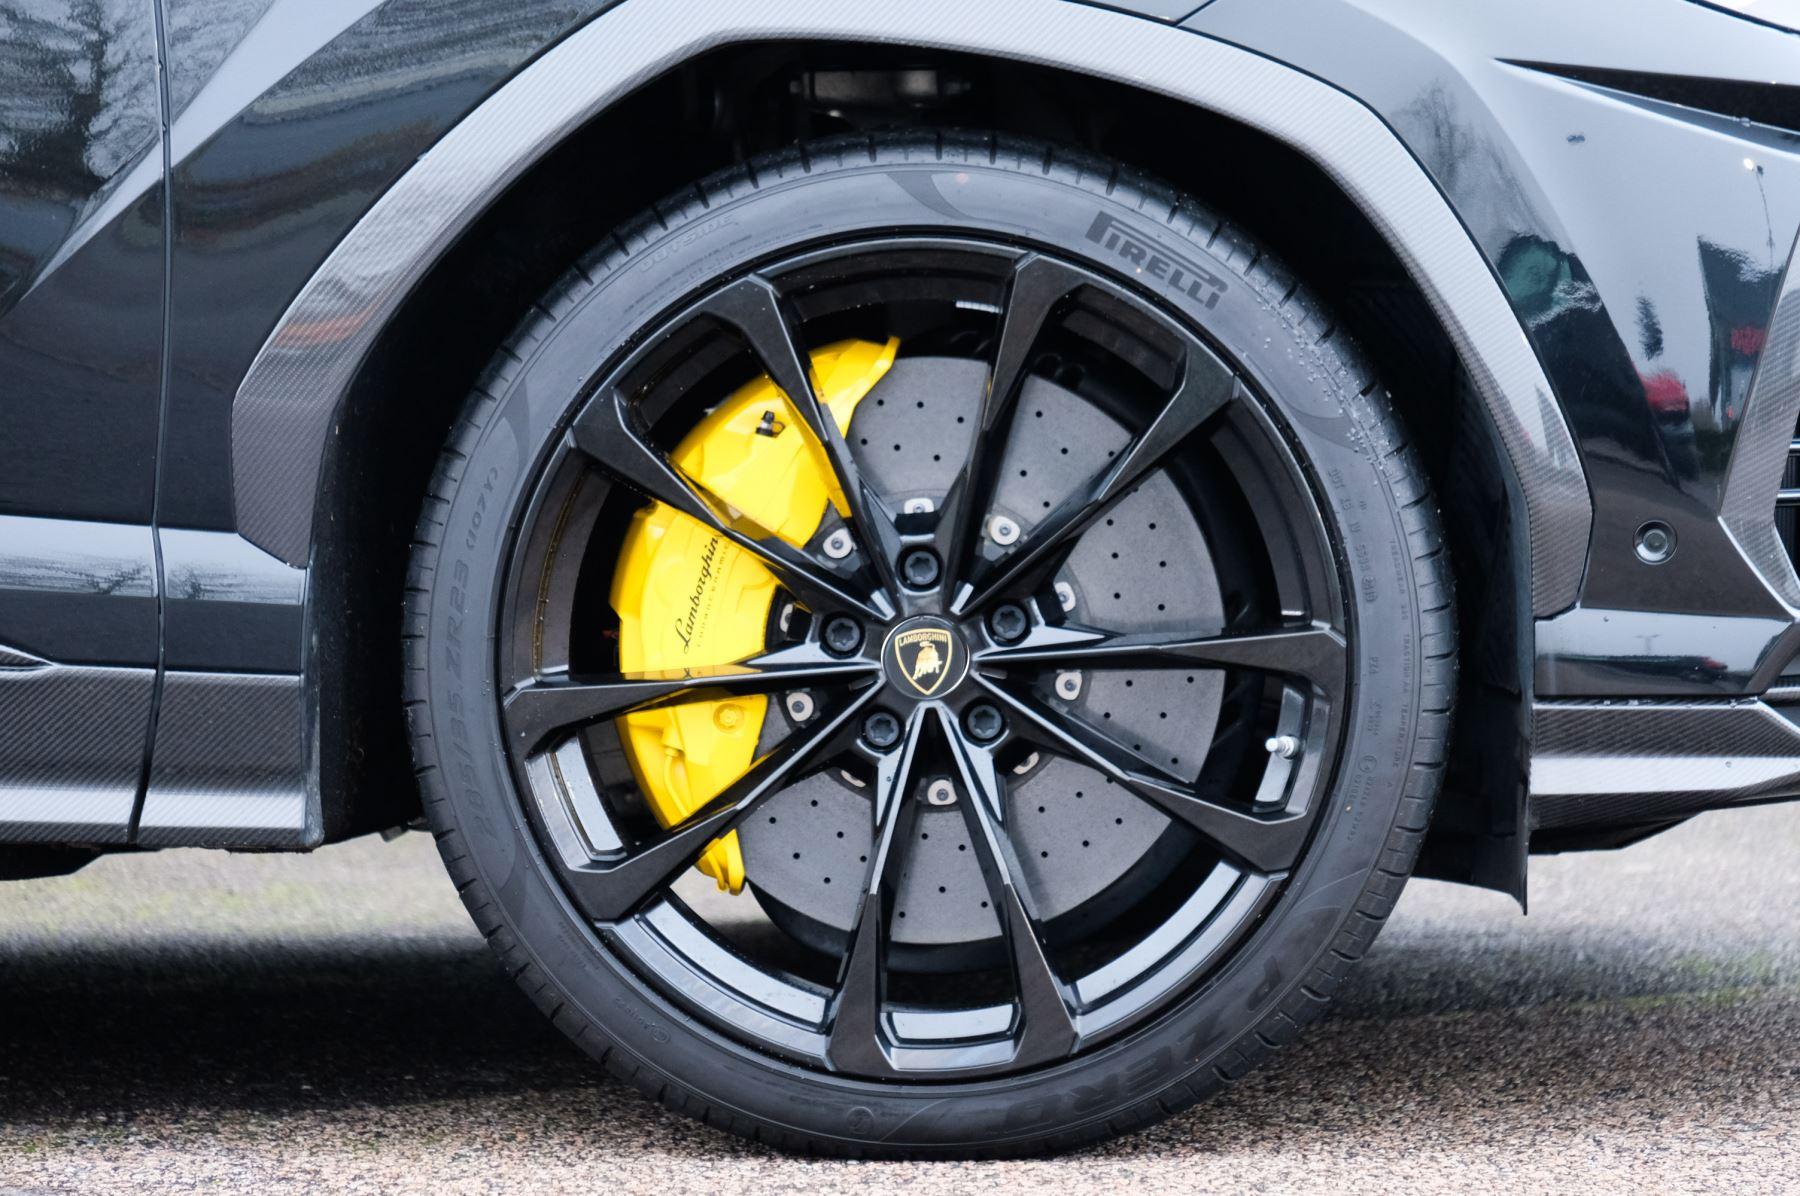 Lamborghini Urus 4.0T FSI V8 5dr Auto - Akrapovic exhaust & Exterior Carbon image 9